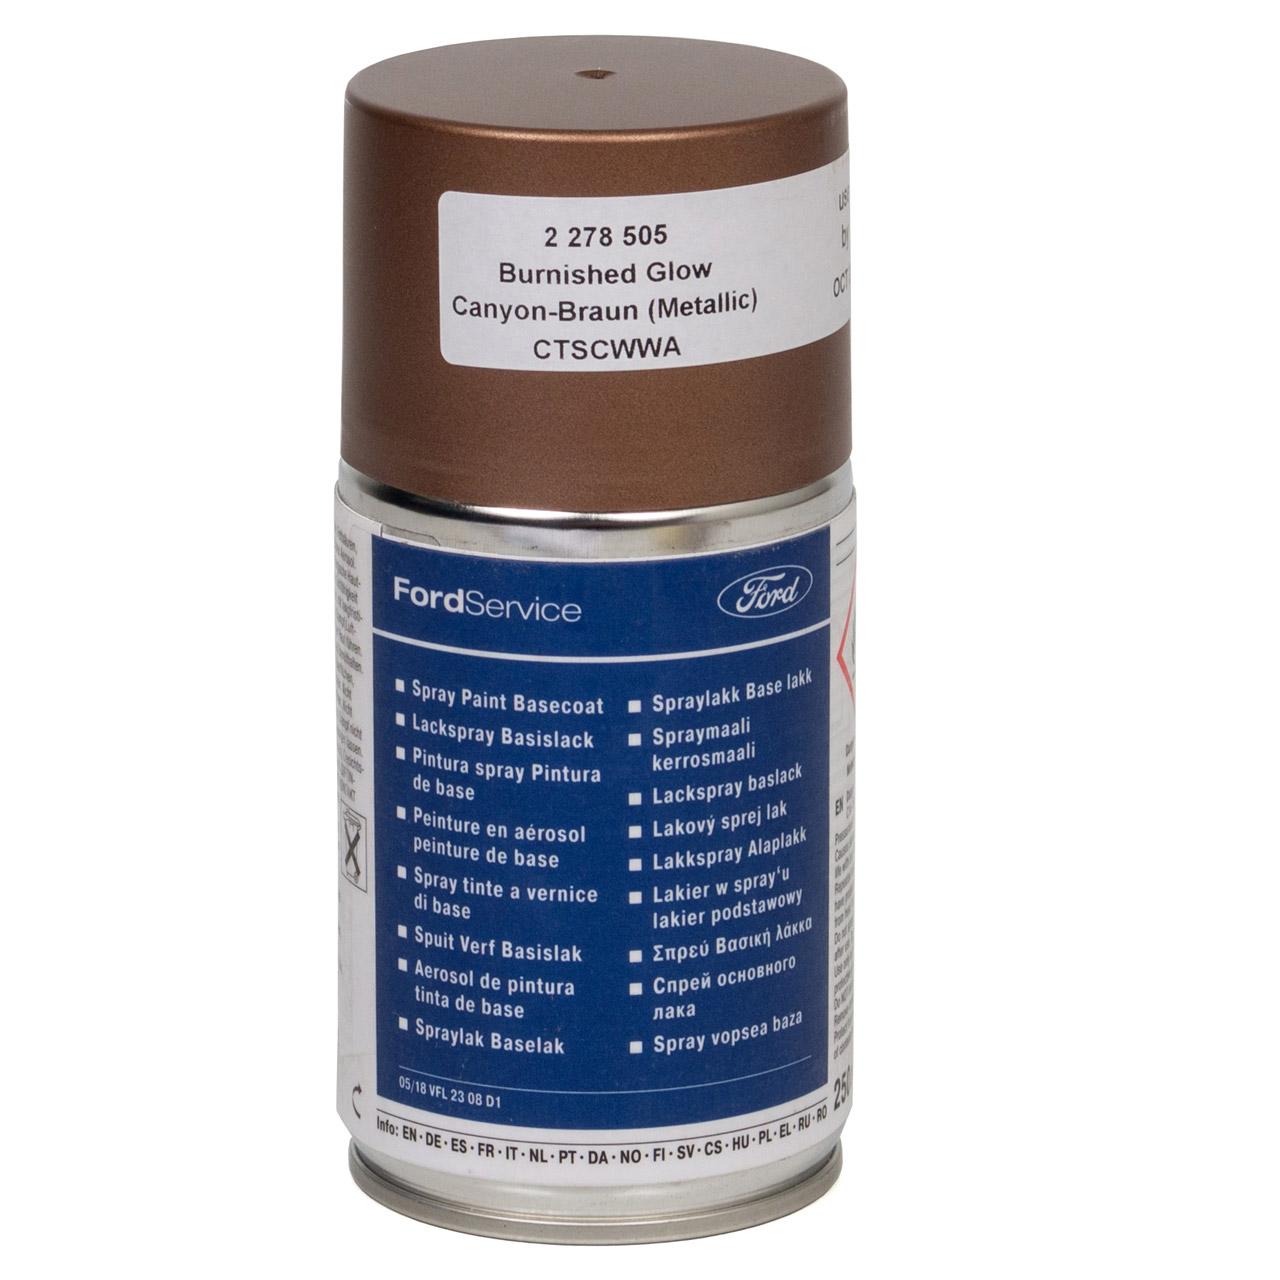 ORIGINAL Ford Lack Sprühdose Spraydose Dose CANYON BRAUN Metallic 250ml 2278505